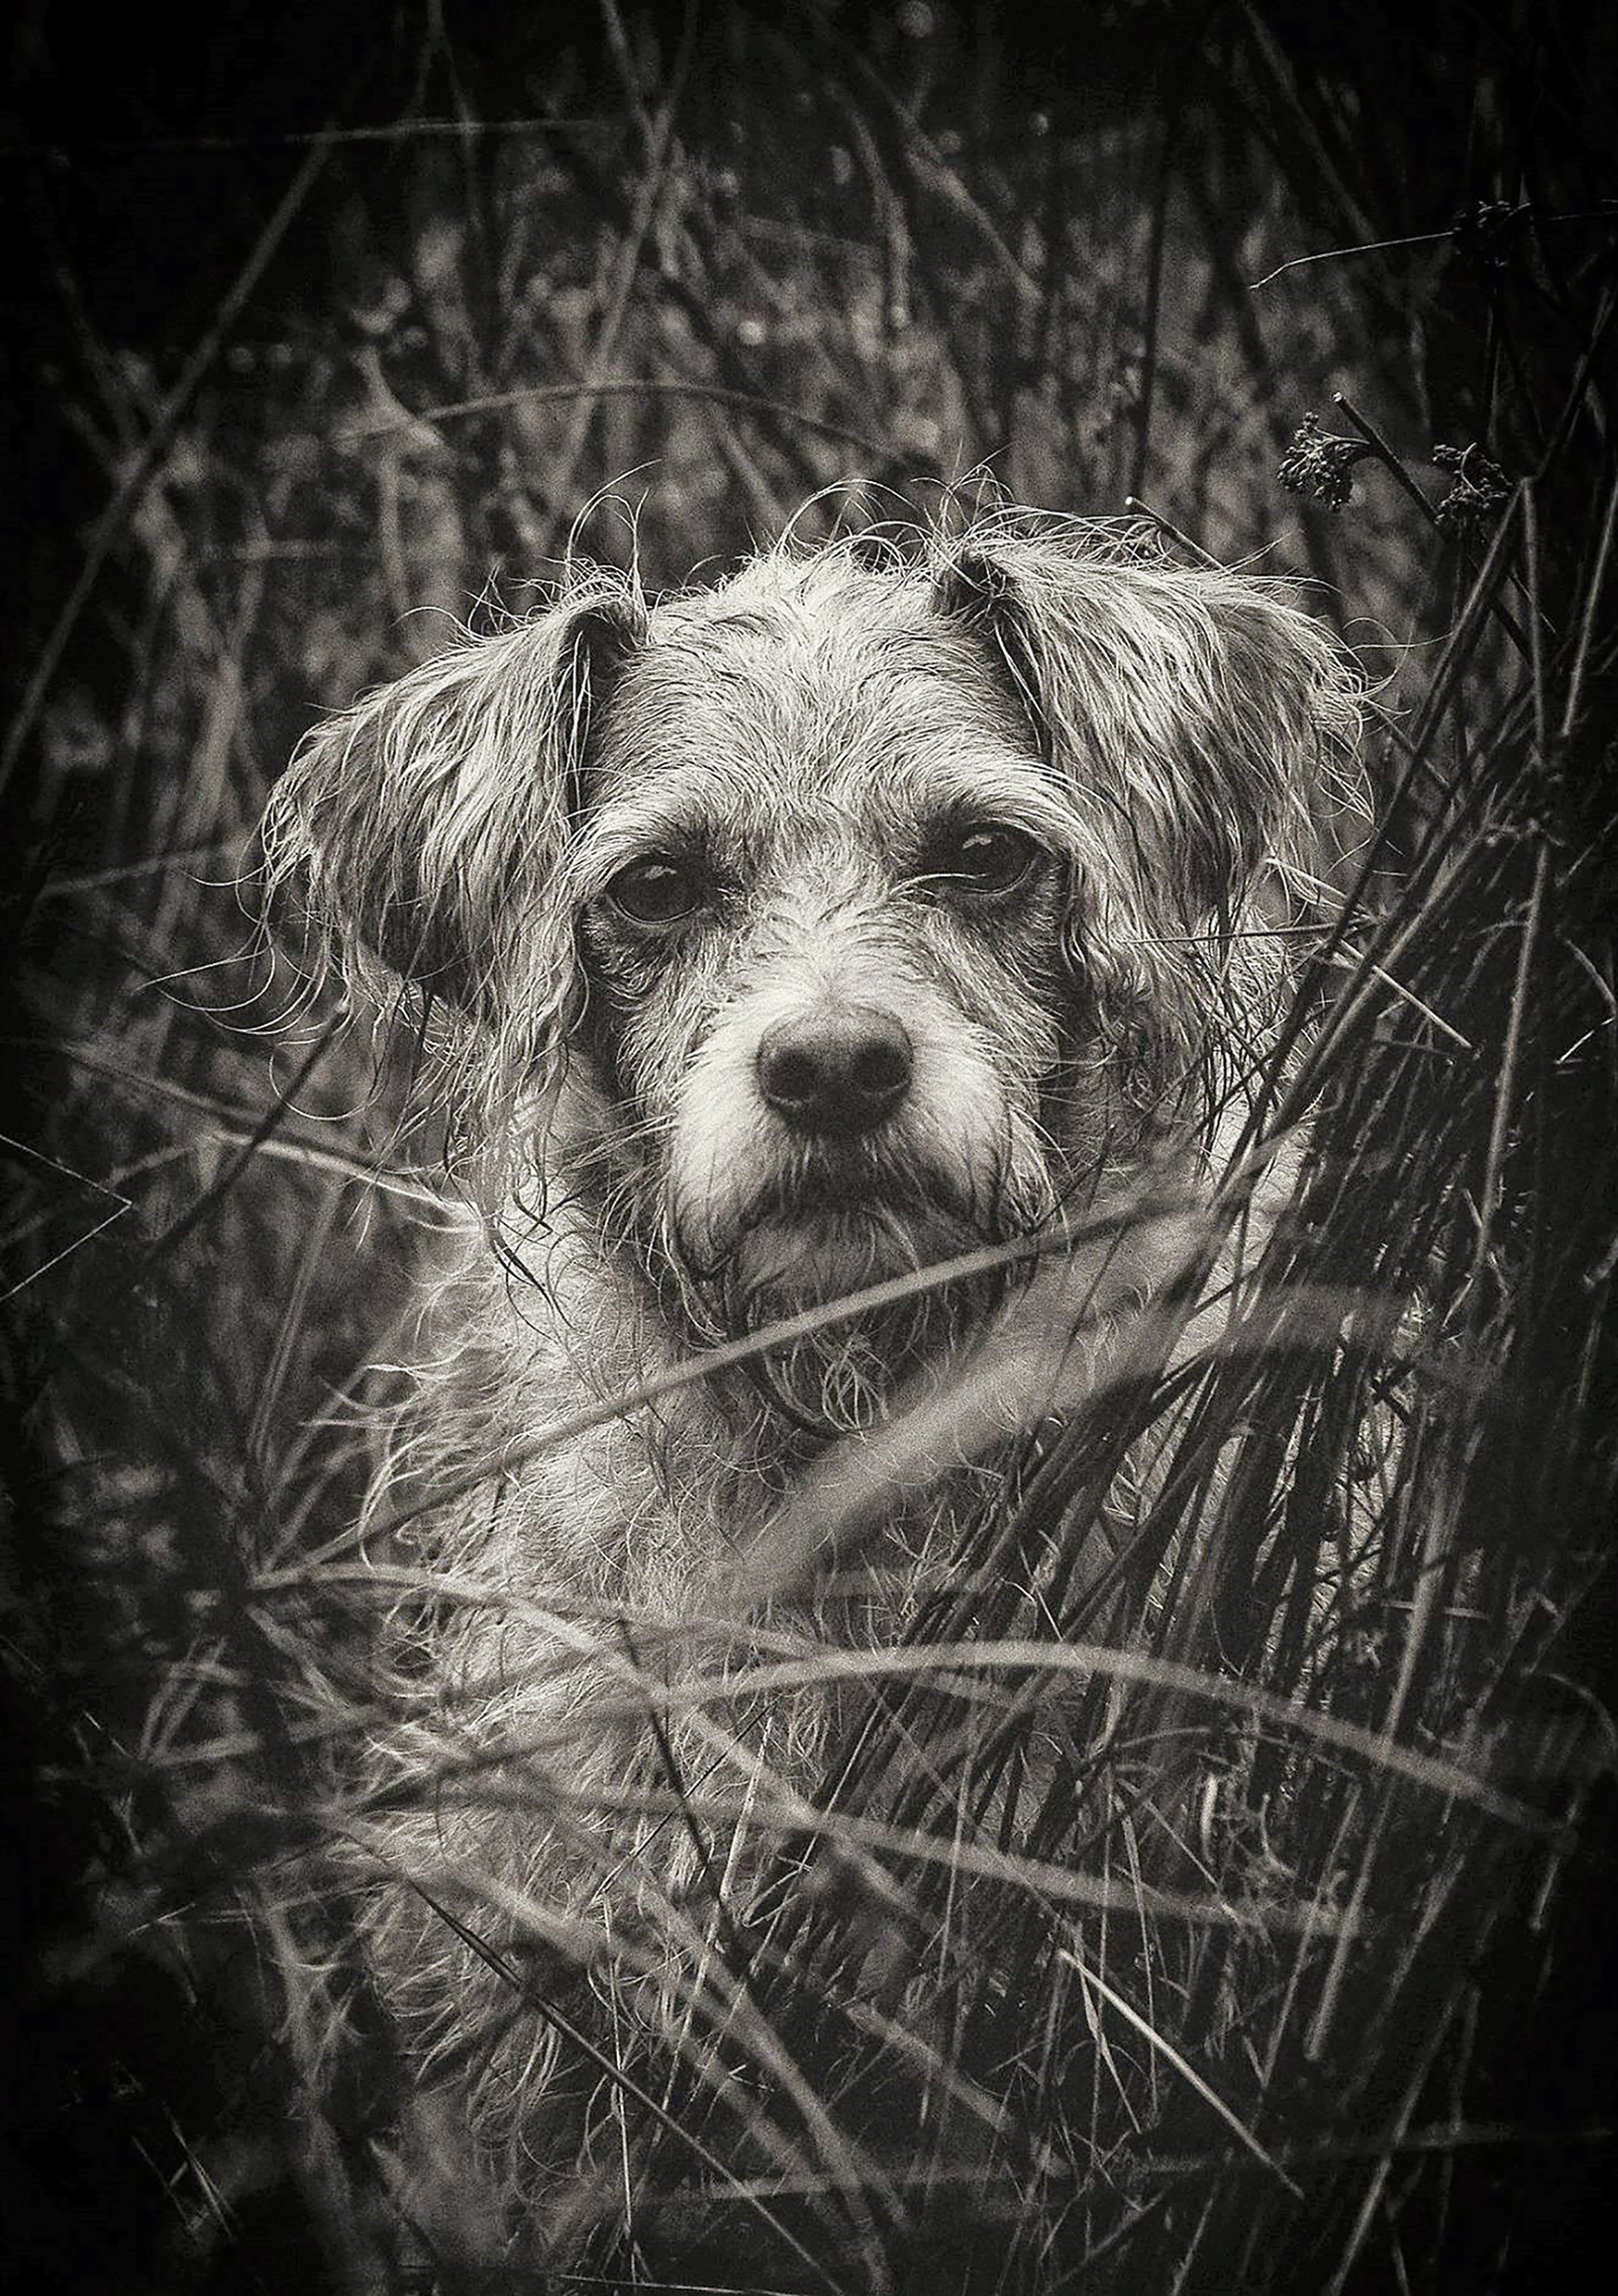 Wild Dog, Dog, Friend, Loyal, Nature, HQ Photo